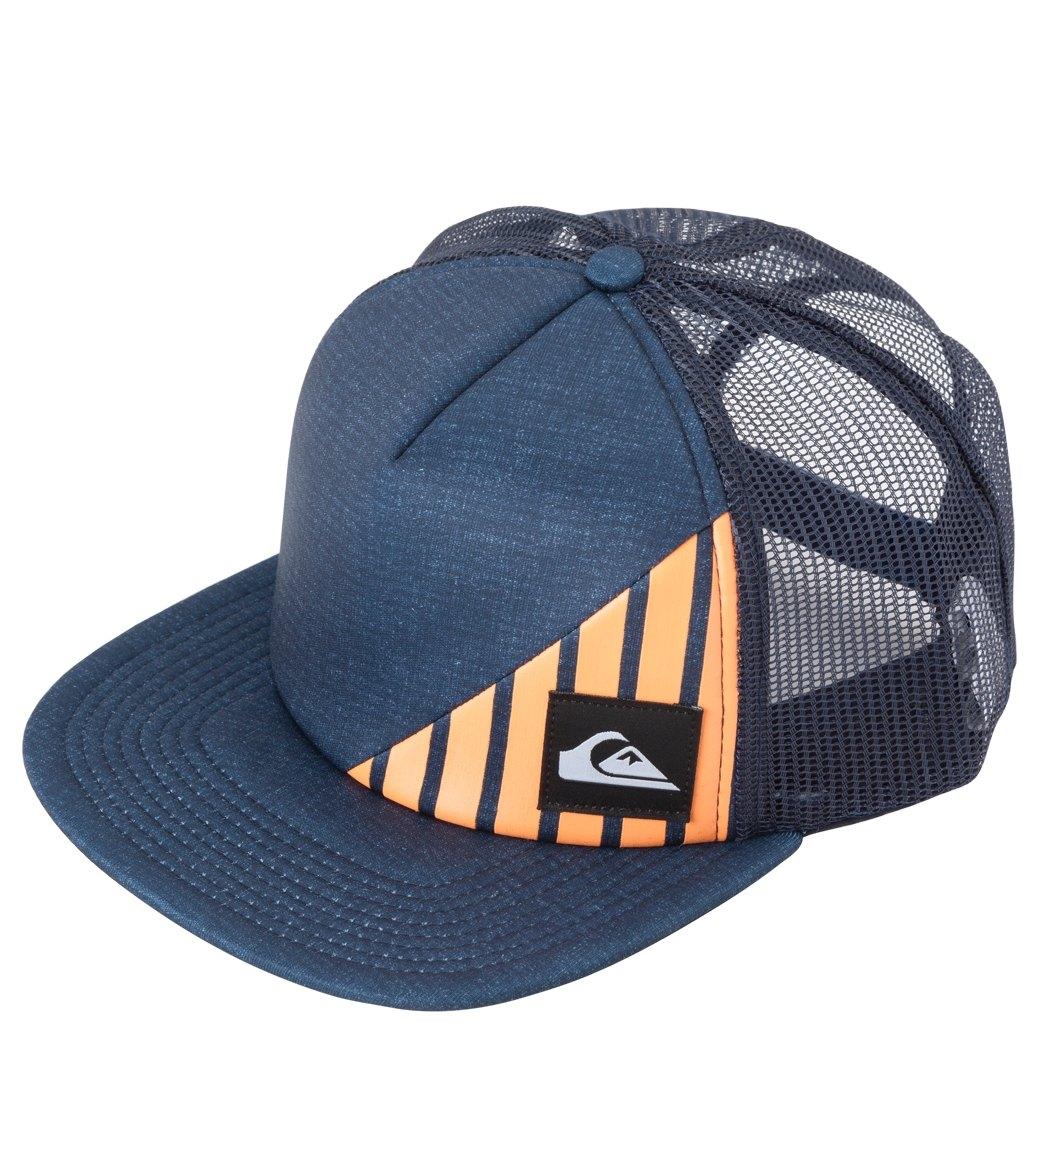 san francisco b1d85 eb1a3 ... Quiksilver Men s New Wave Comp Hat. Share